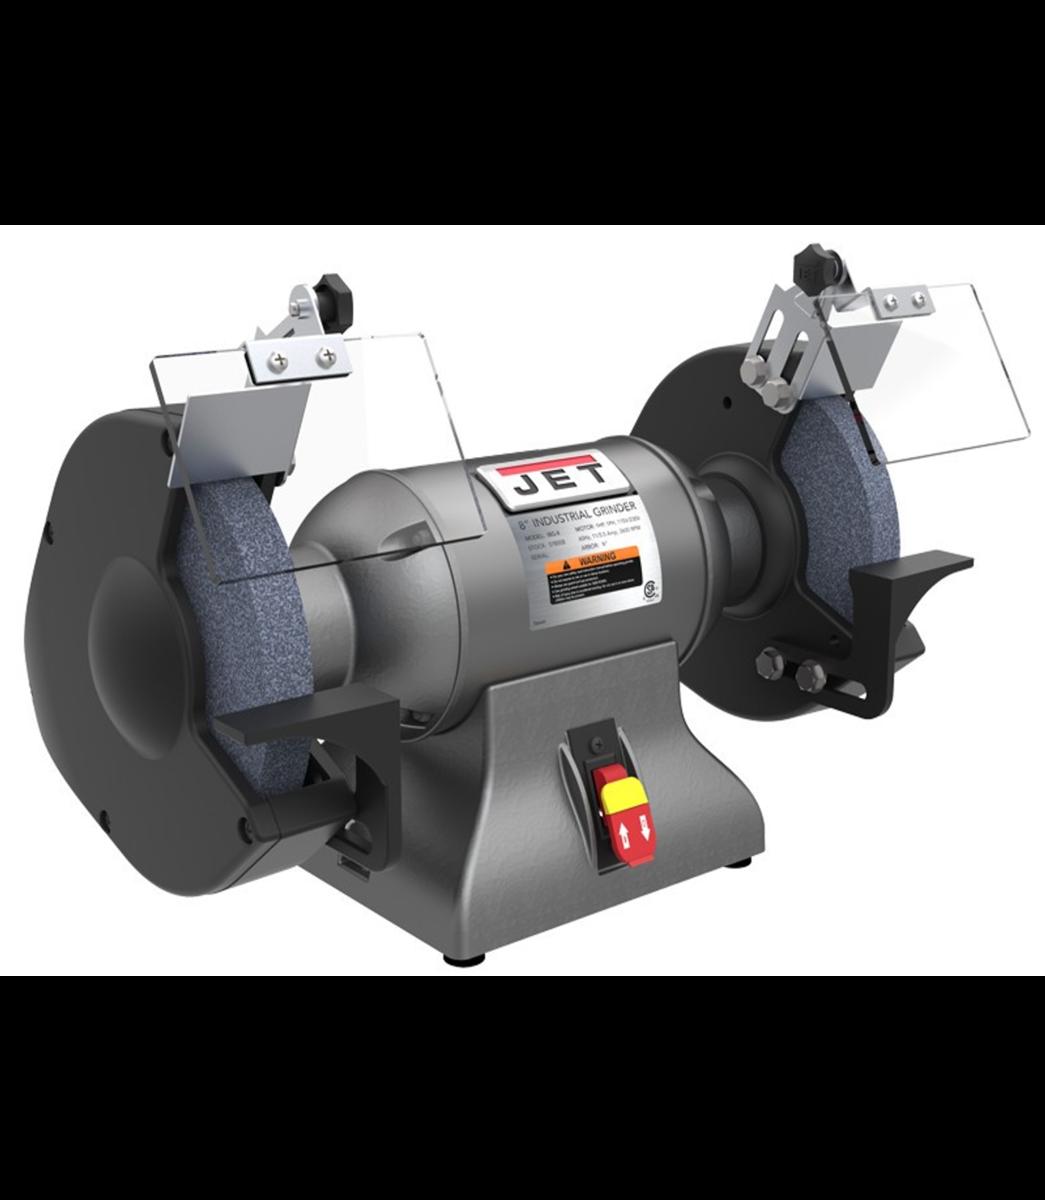 "IBG-8, 8"" Industrial Bench Grinder"